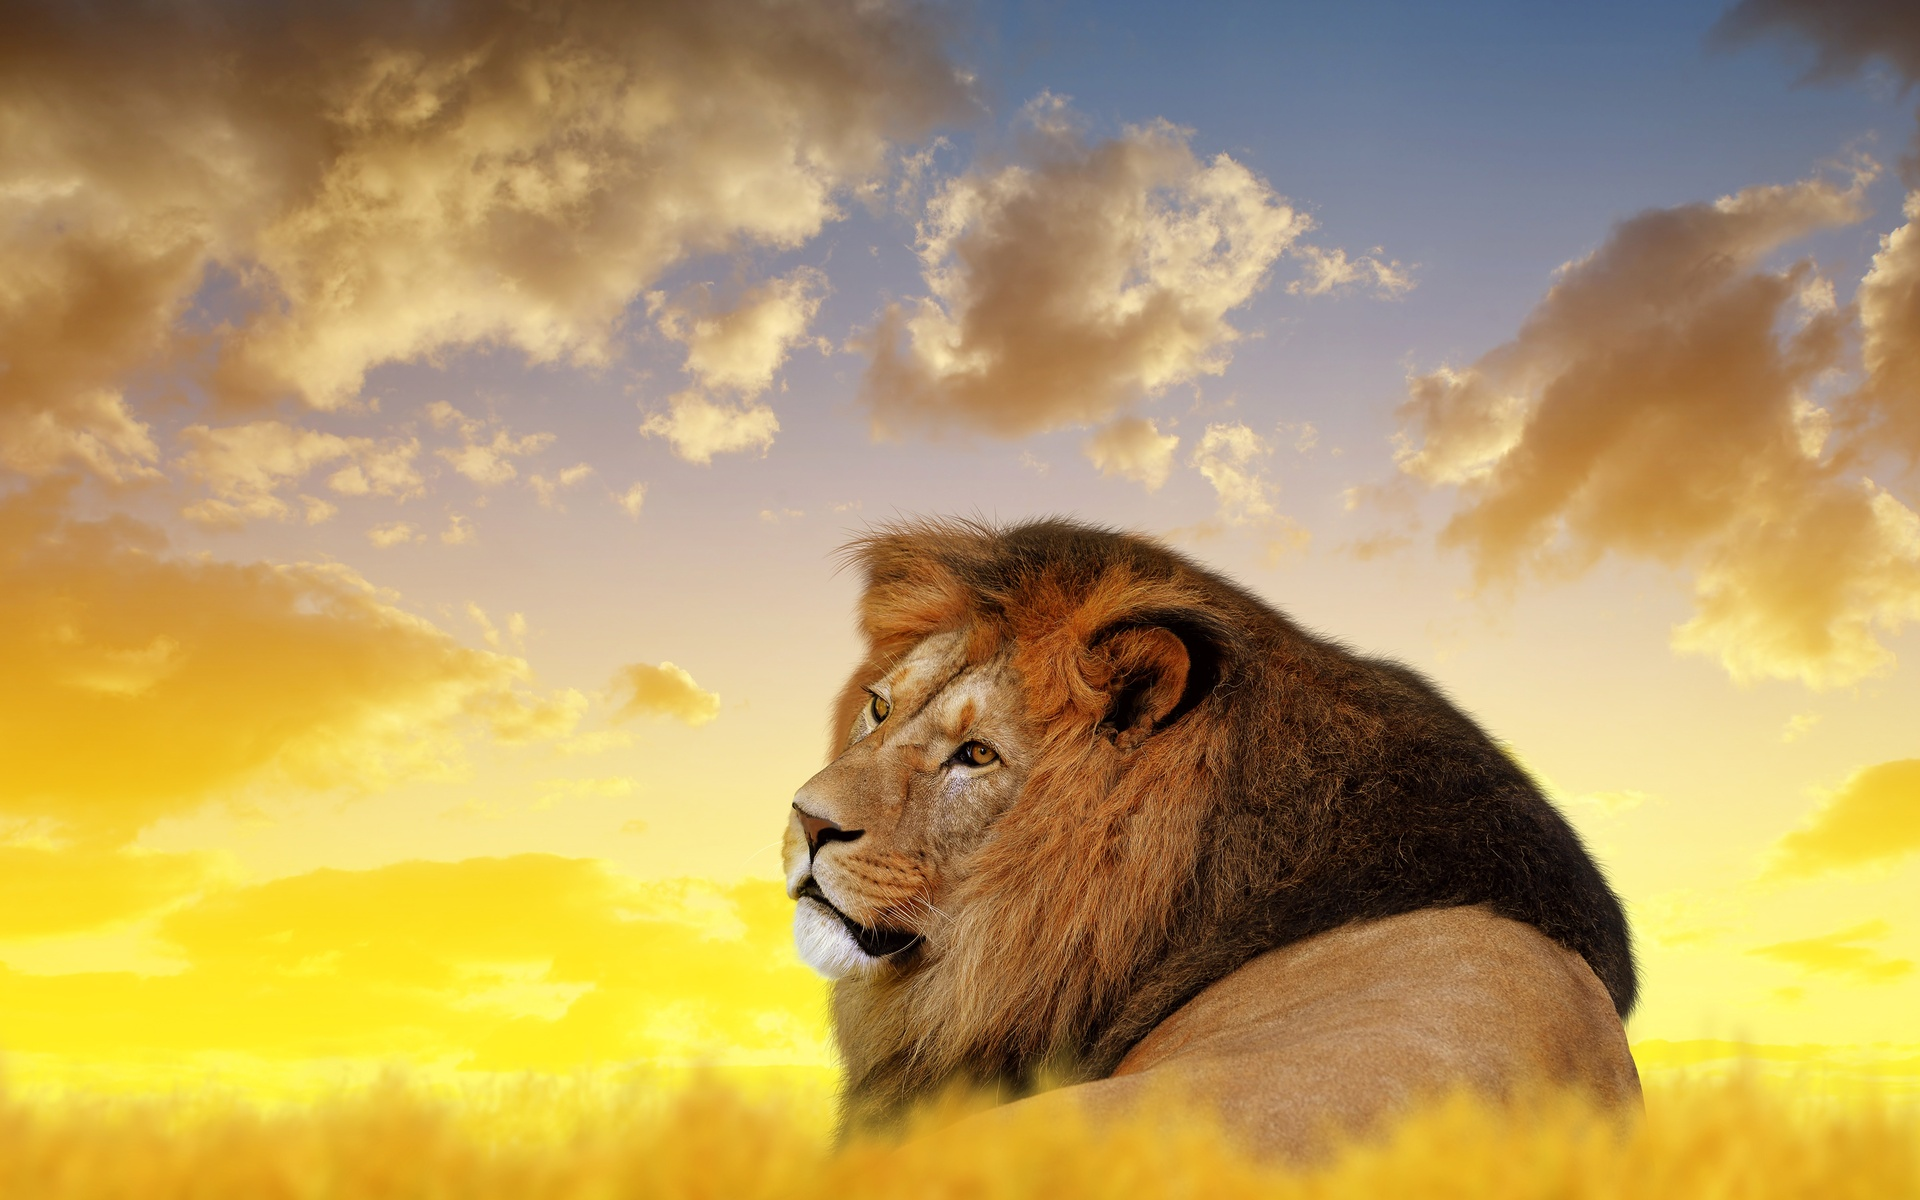 lion-ultra-hd-4k-8e.jpg